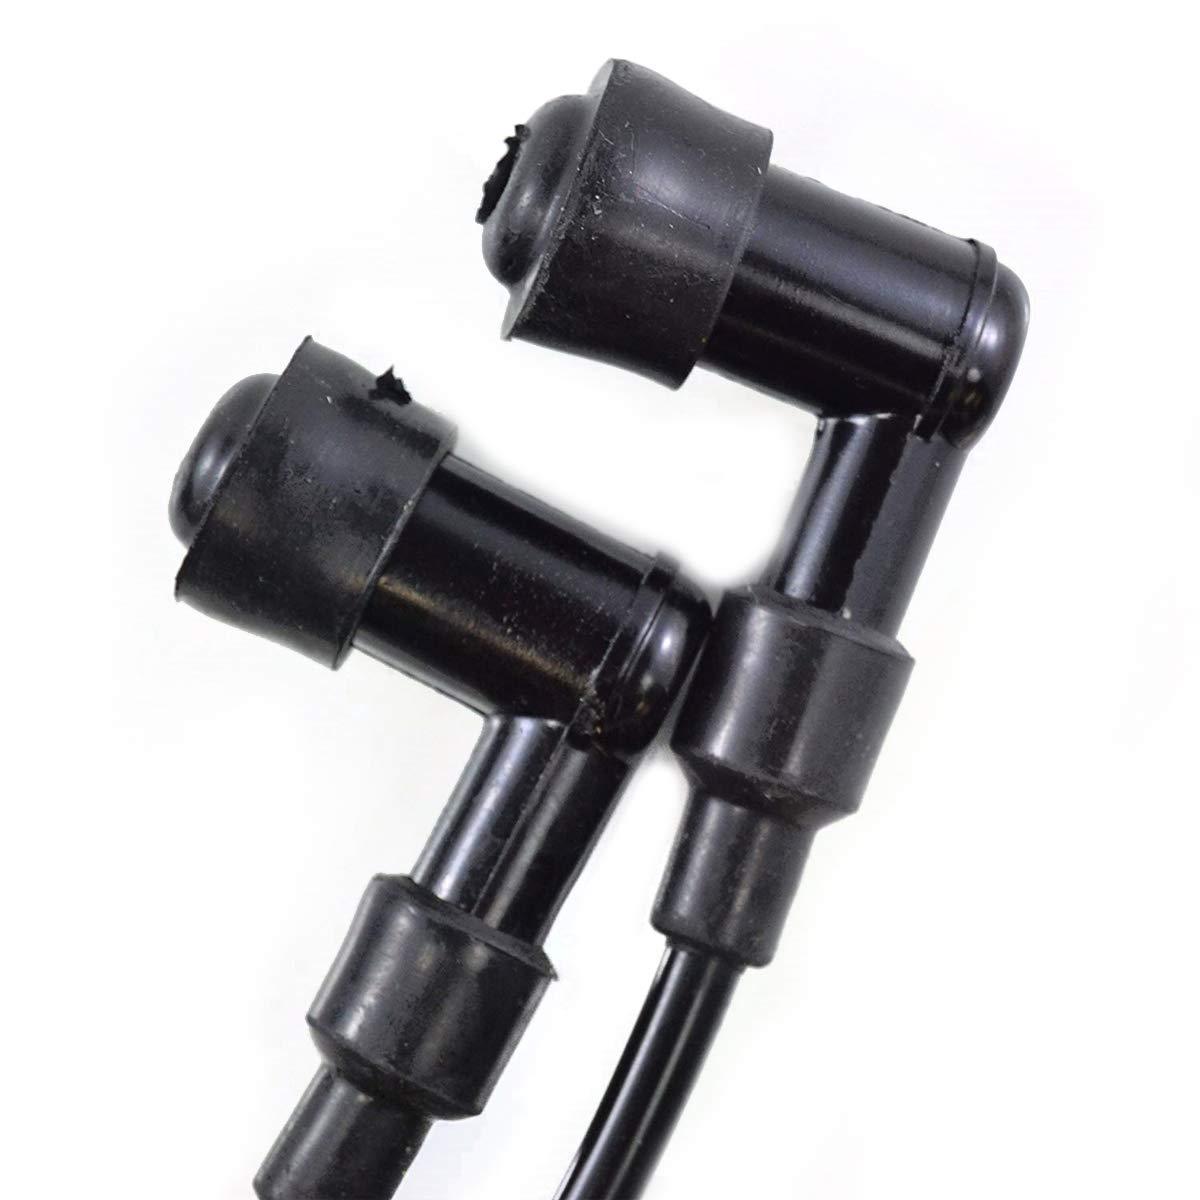 Triumilynn External Ignition Coil Fits for Yamaha Banshee 350 YFZ350 1987-2006 Replace Part NO 2GU-82310-50-00 2GU-82310-51-00 3LC-82310-00-00 3XC-82310-01-00 3LC-82310-01-00 HAOCHENGQIPEI